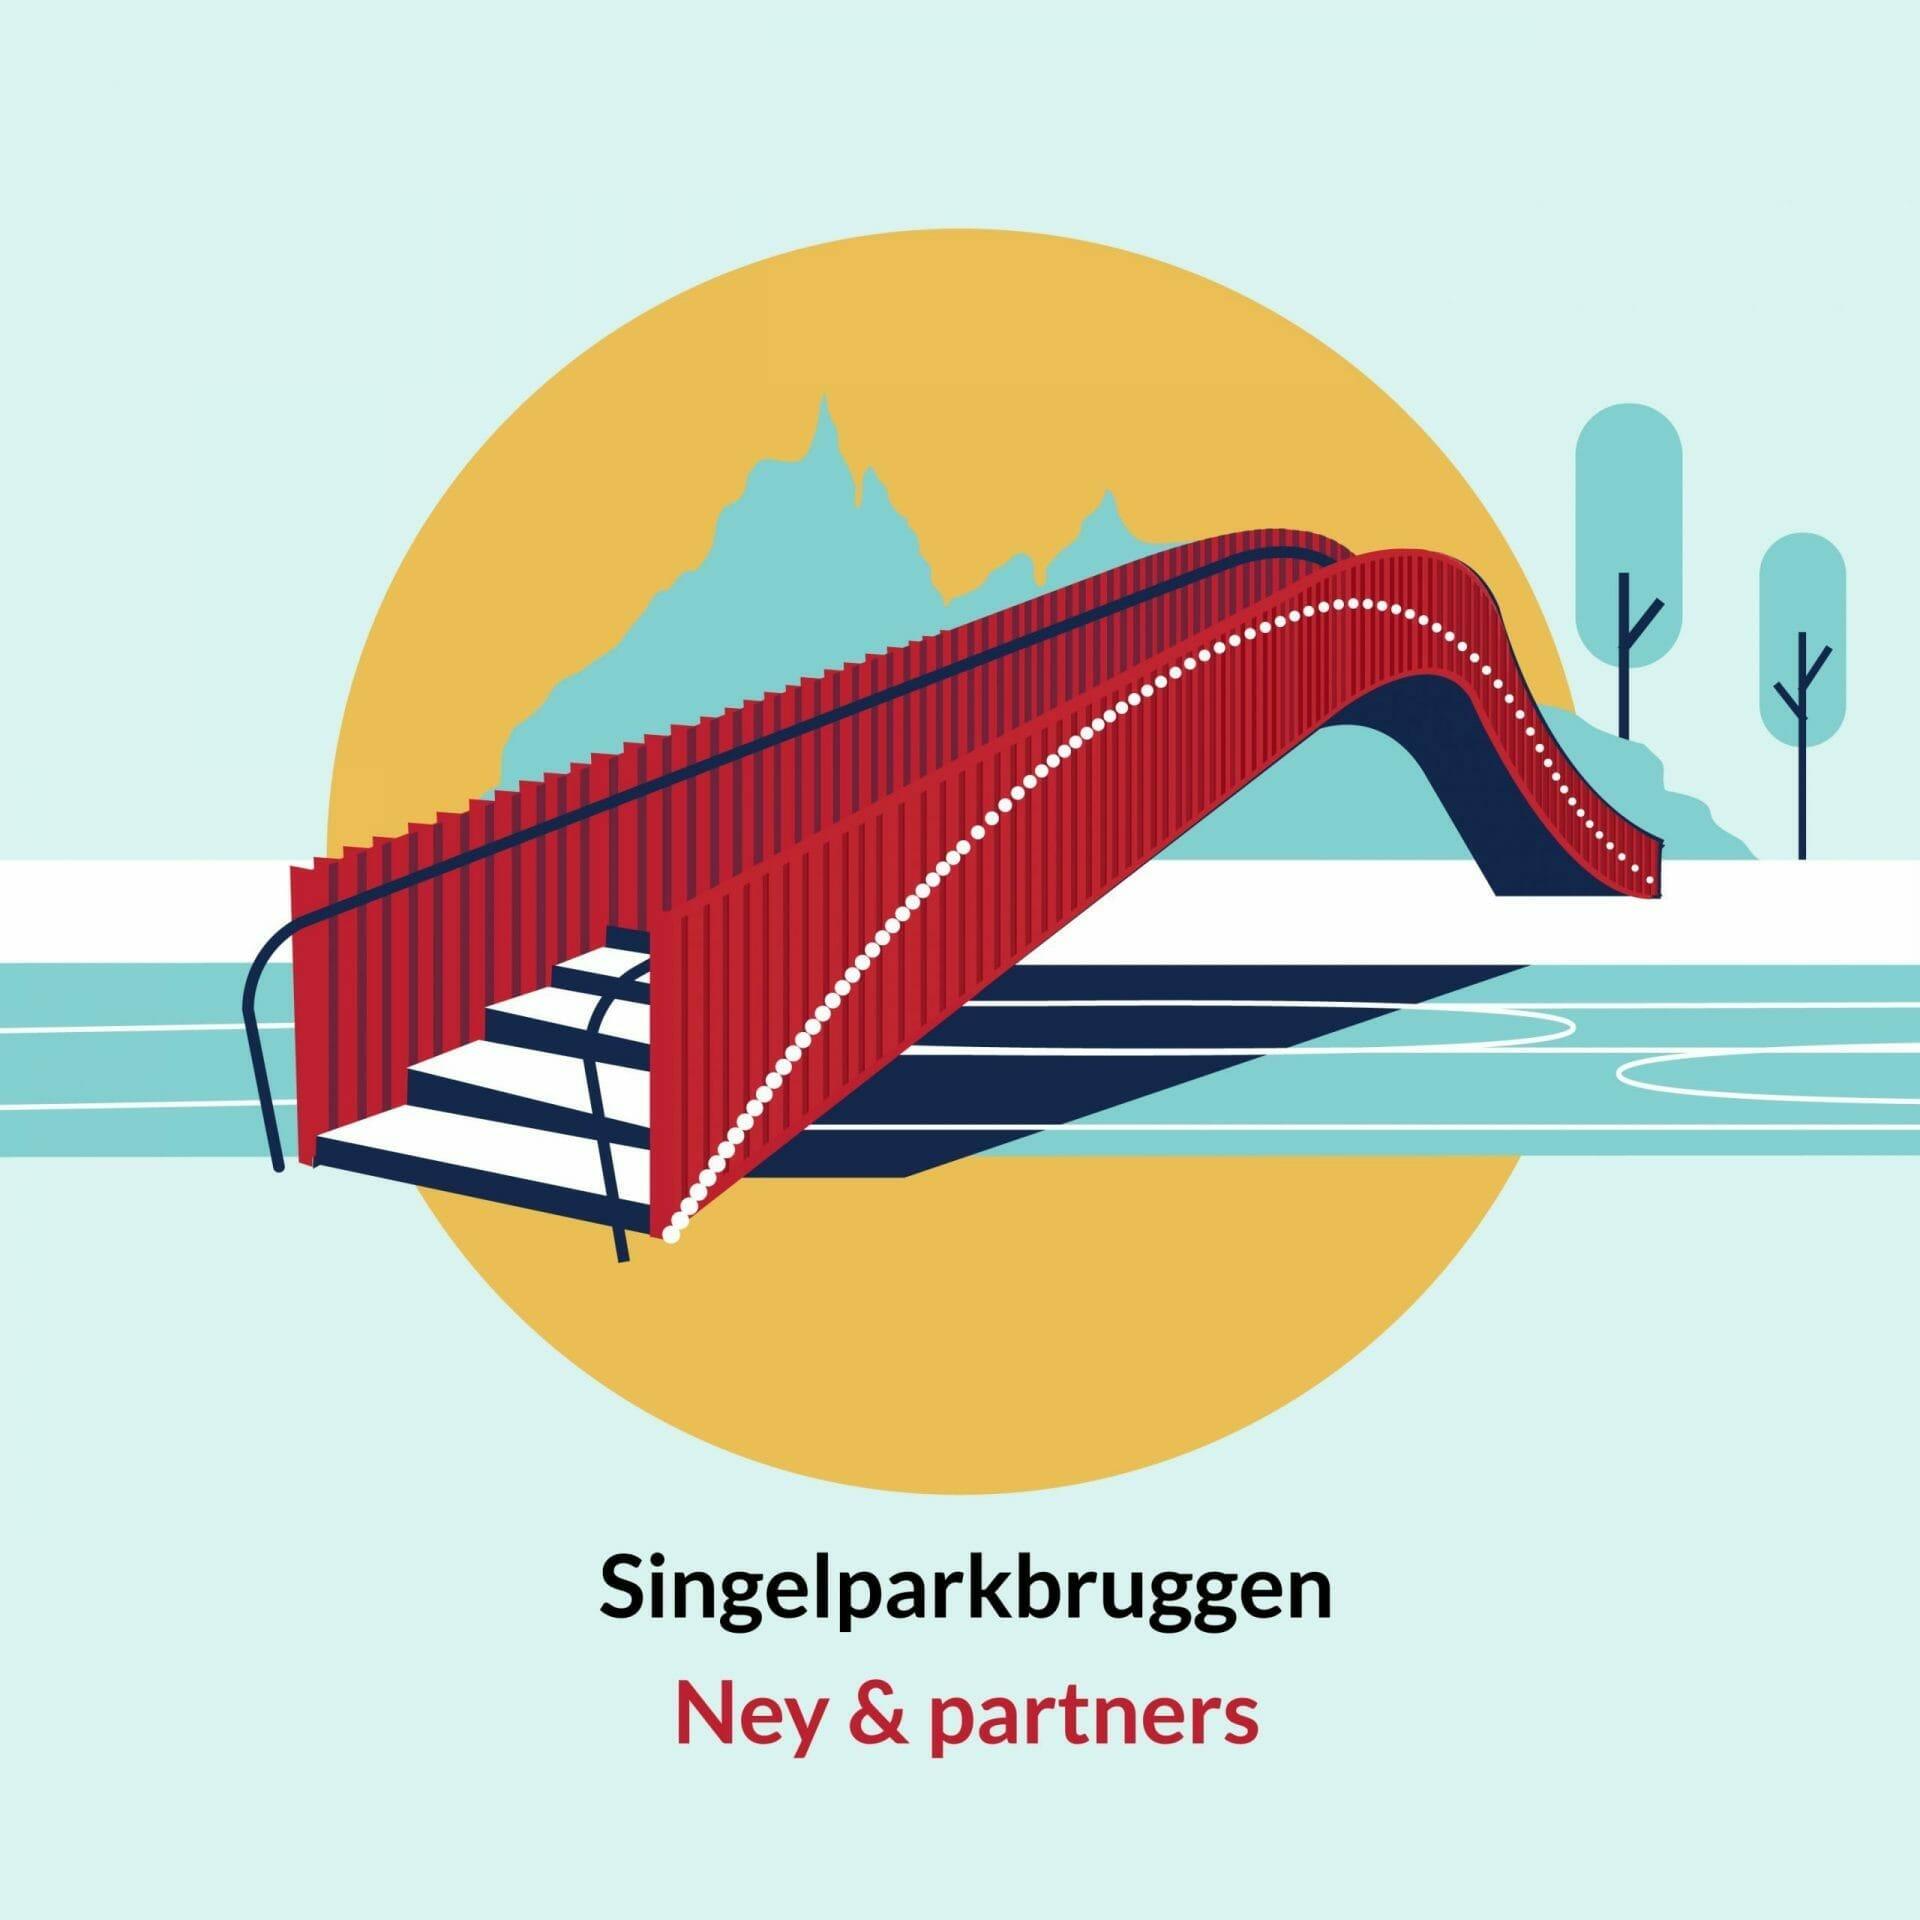 Singelparkbruggen